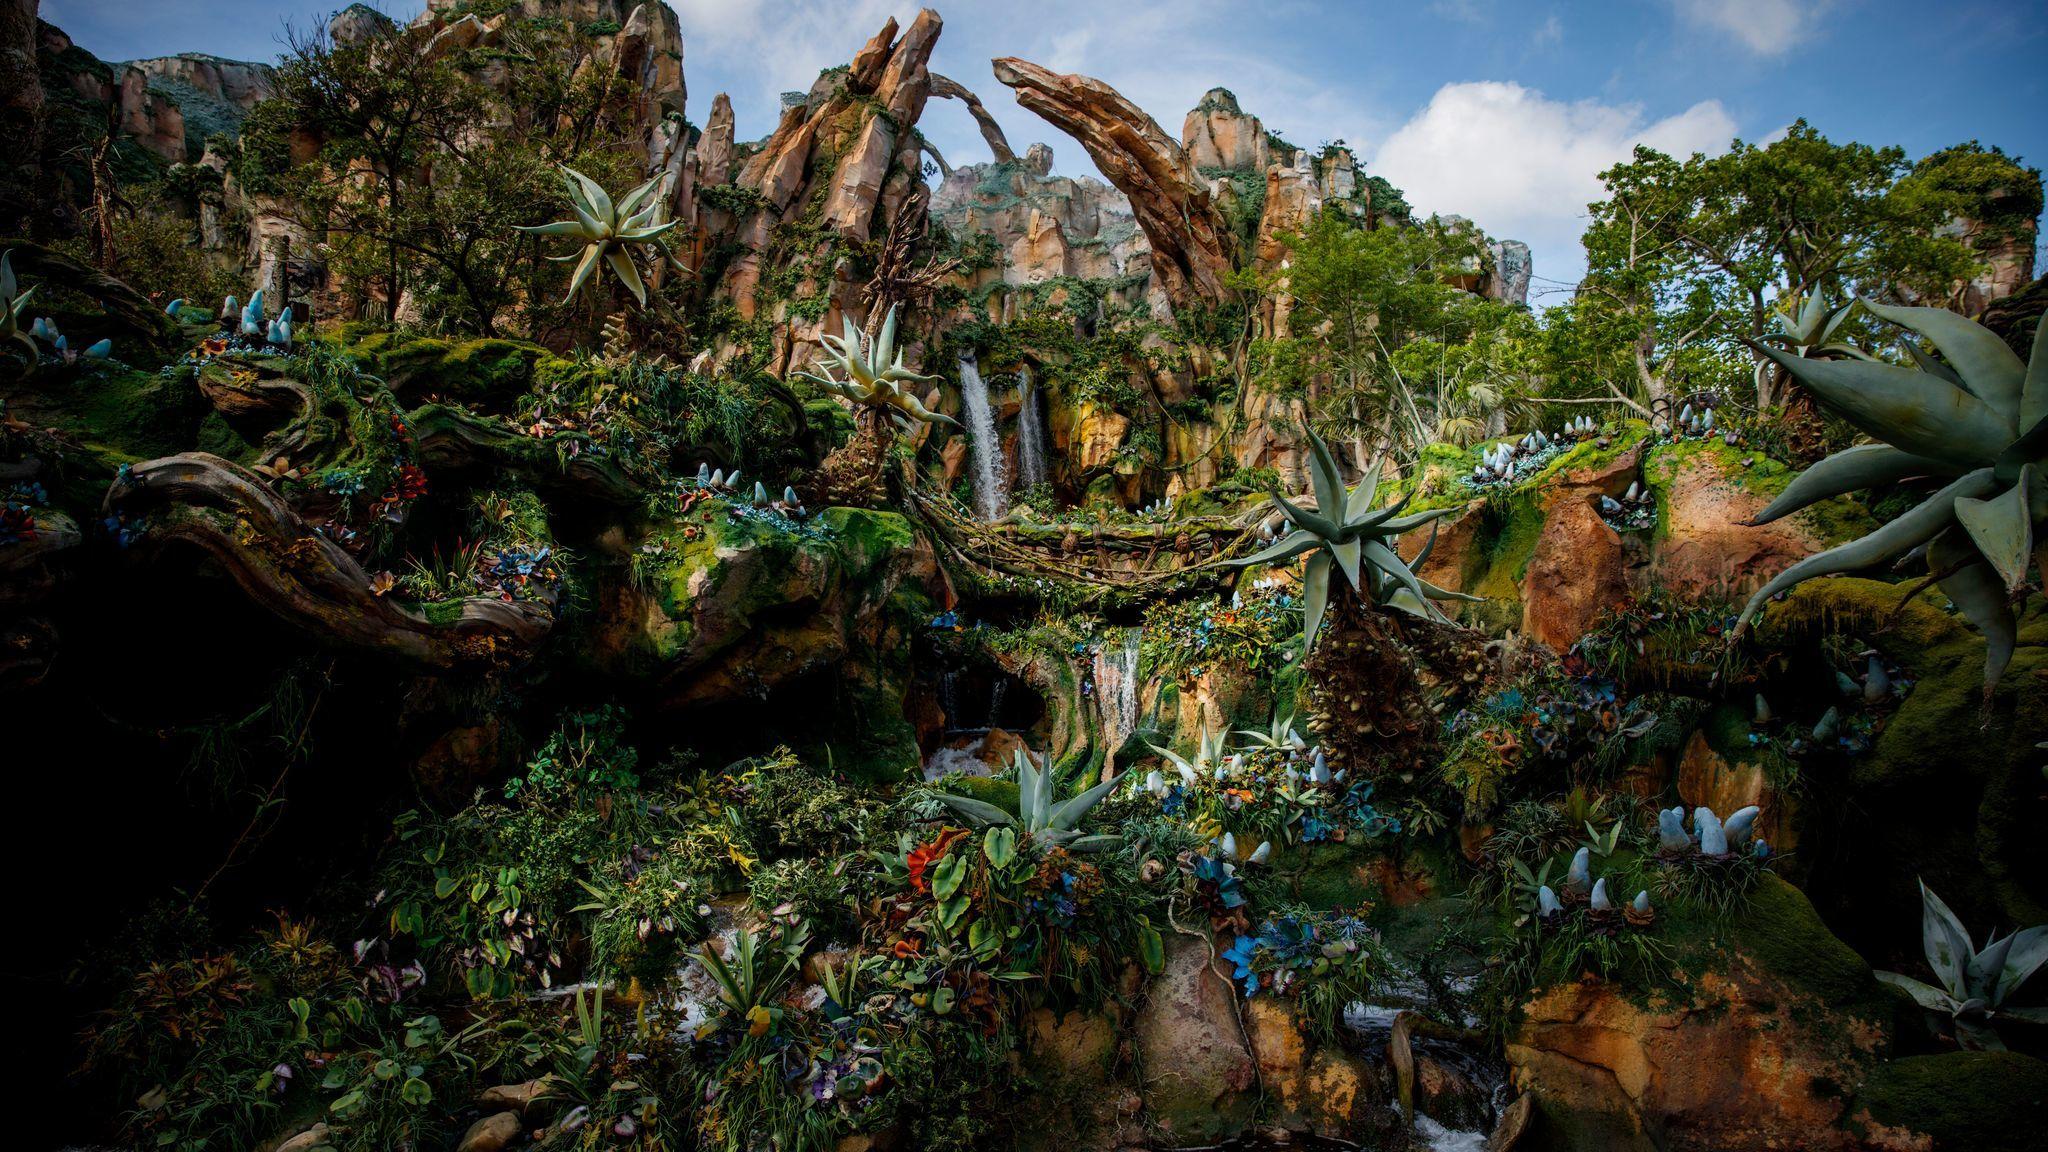 Pandora at Walt Disney World's Animal Kingdom in Florida treats the entire land as environmental storytelling.